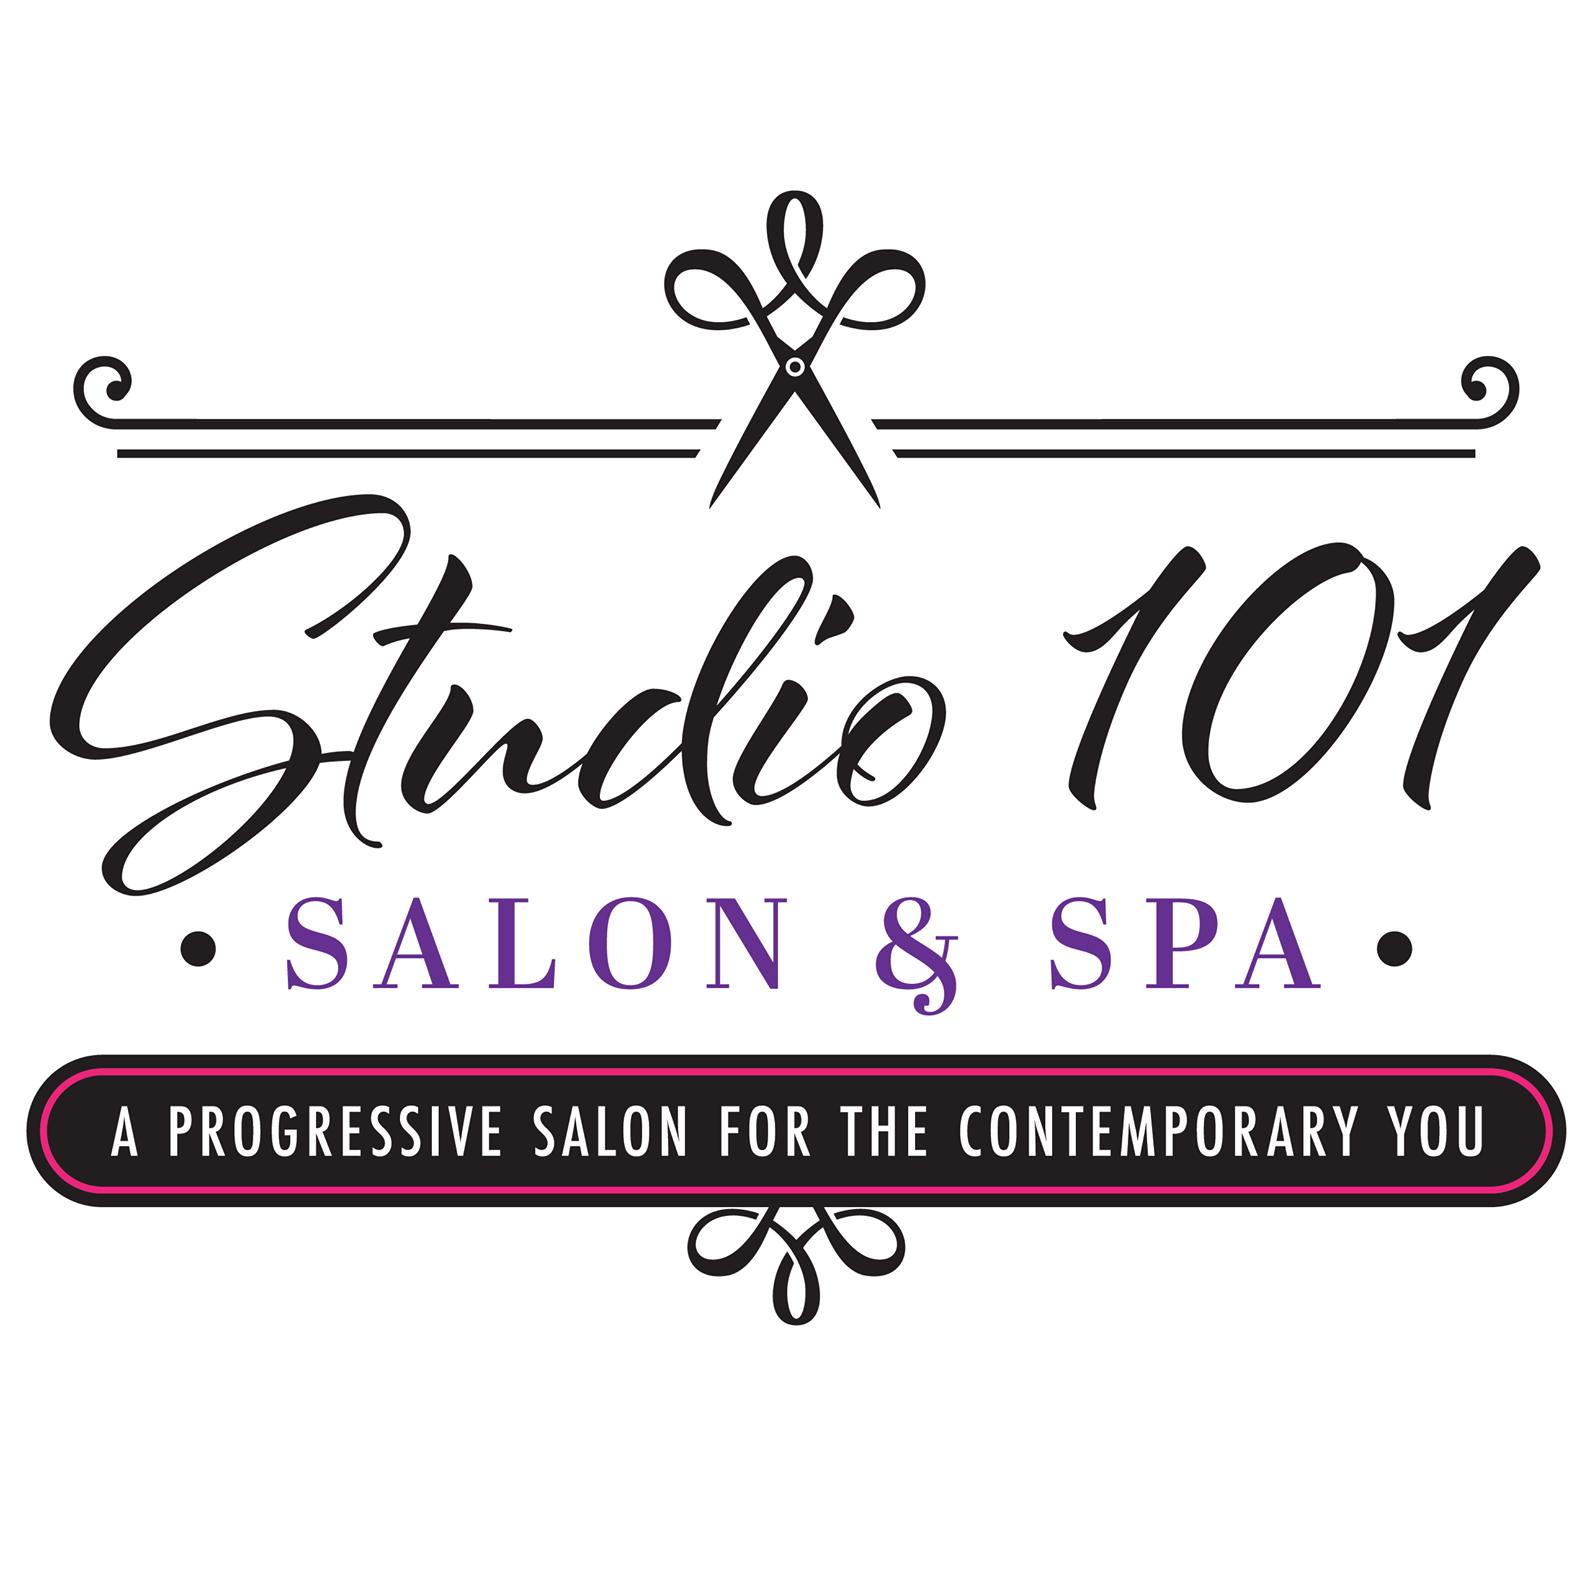 Studio 101 Salon & Spa